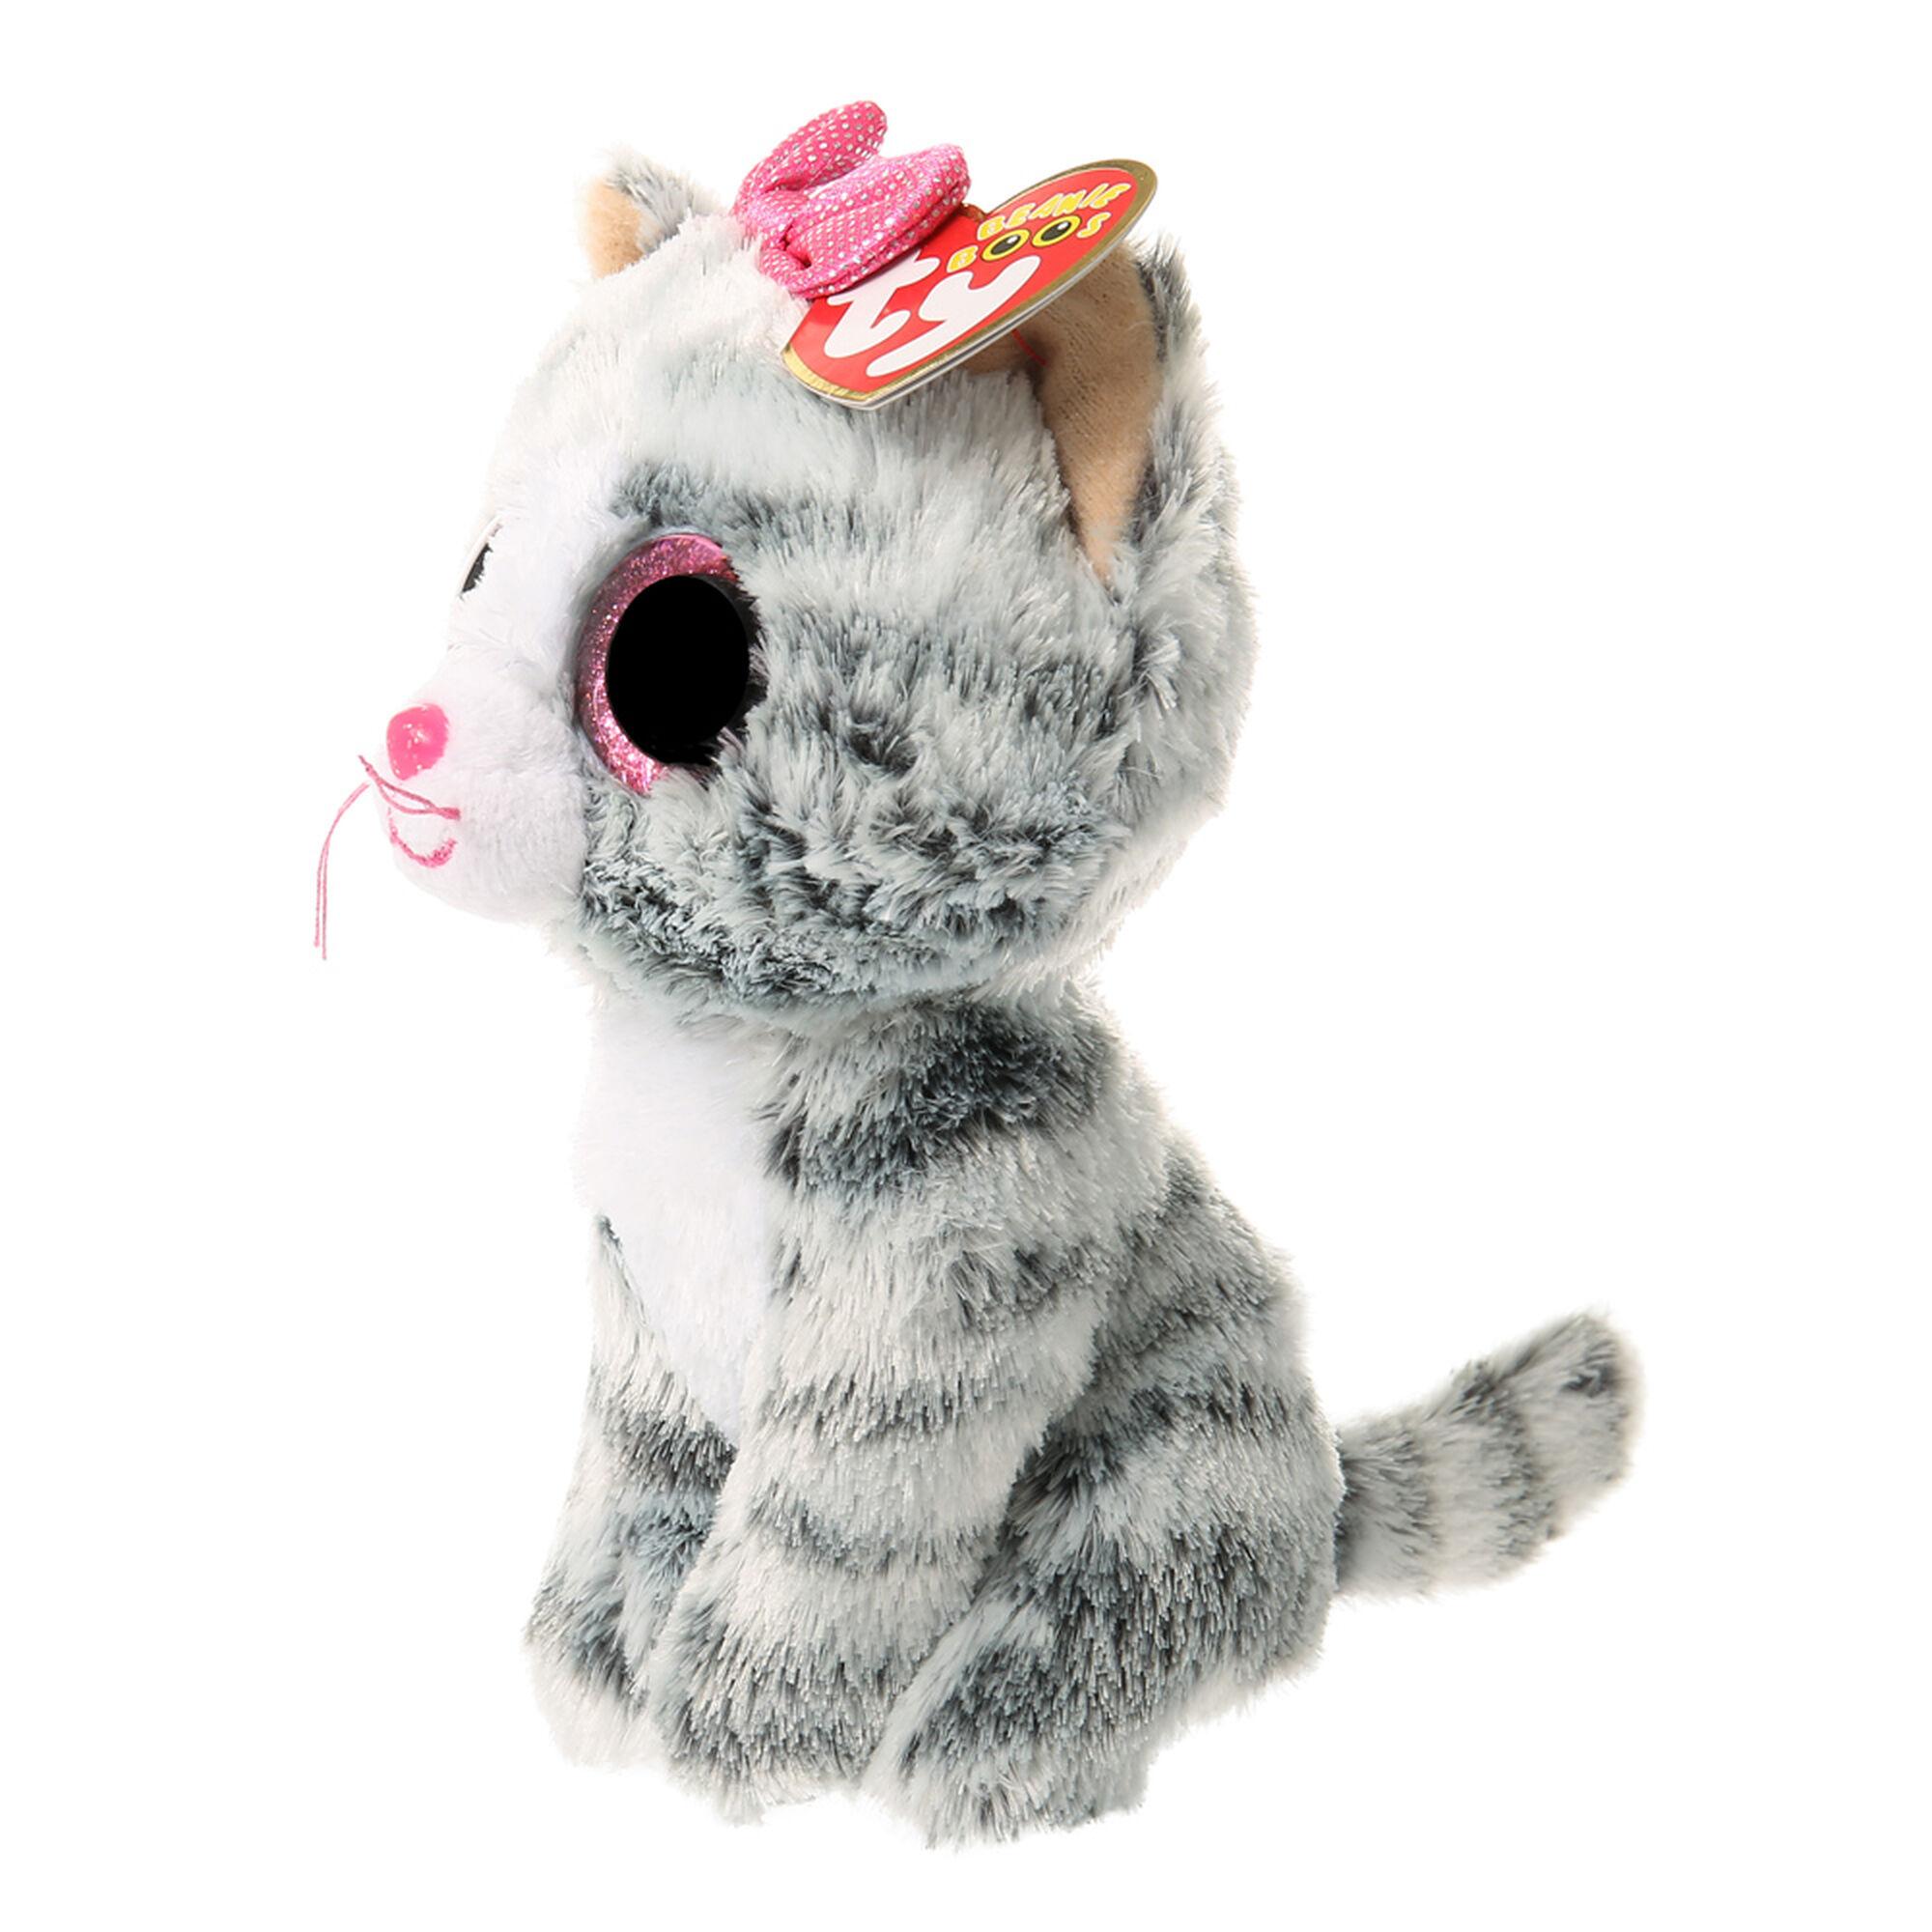 Petite Peluche TY Beanie Boos Kiki Le Chaton